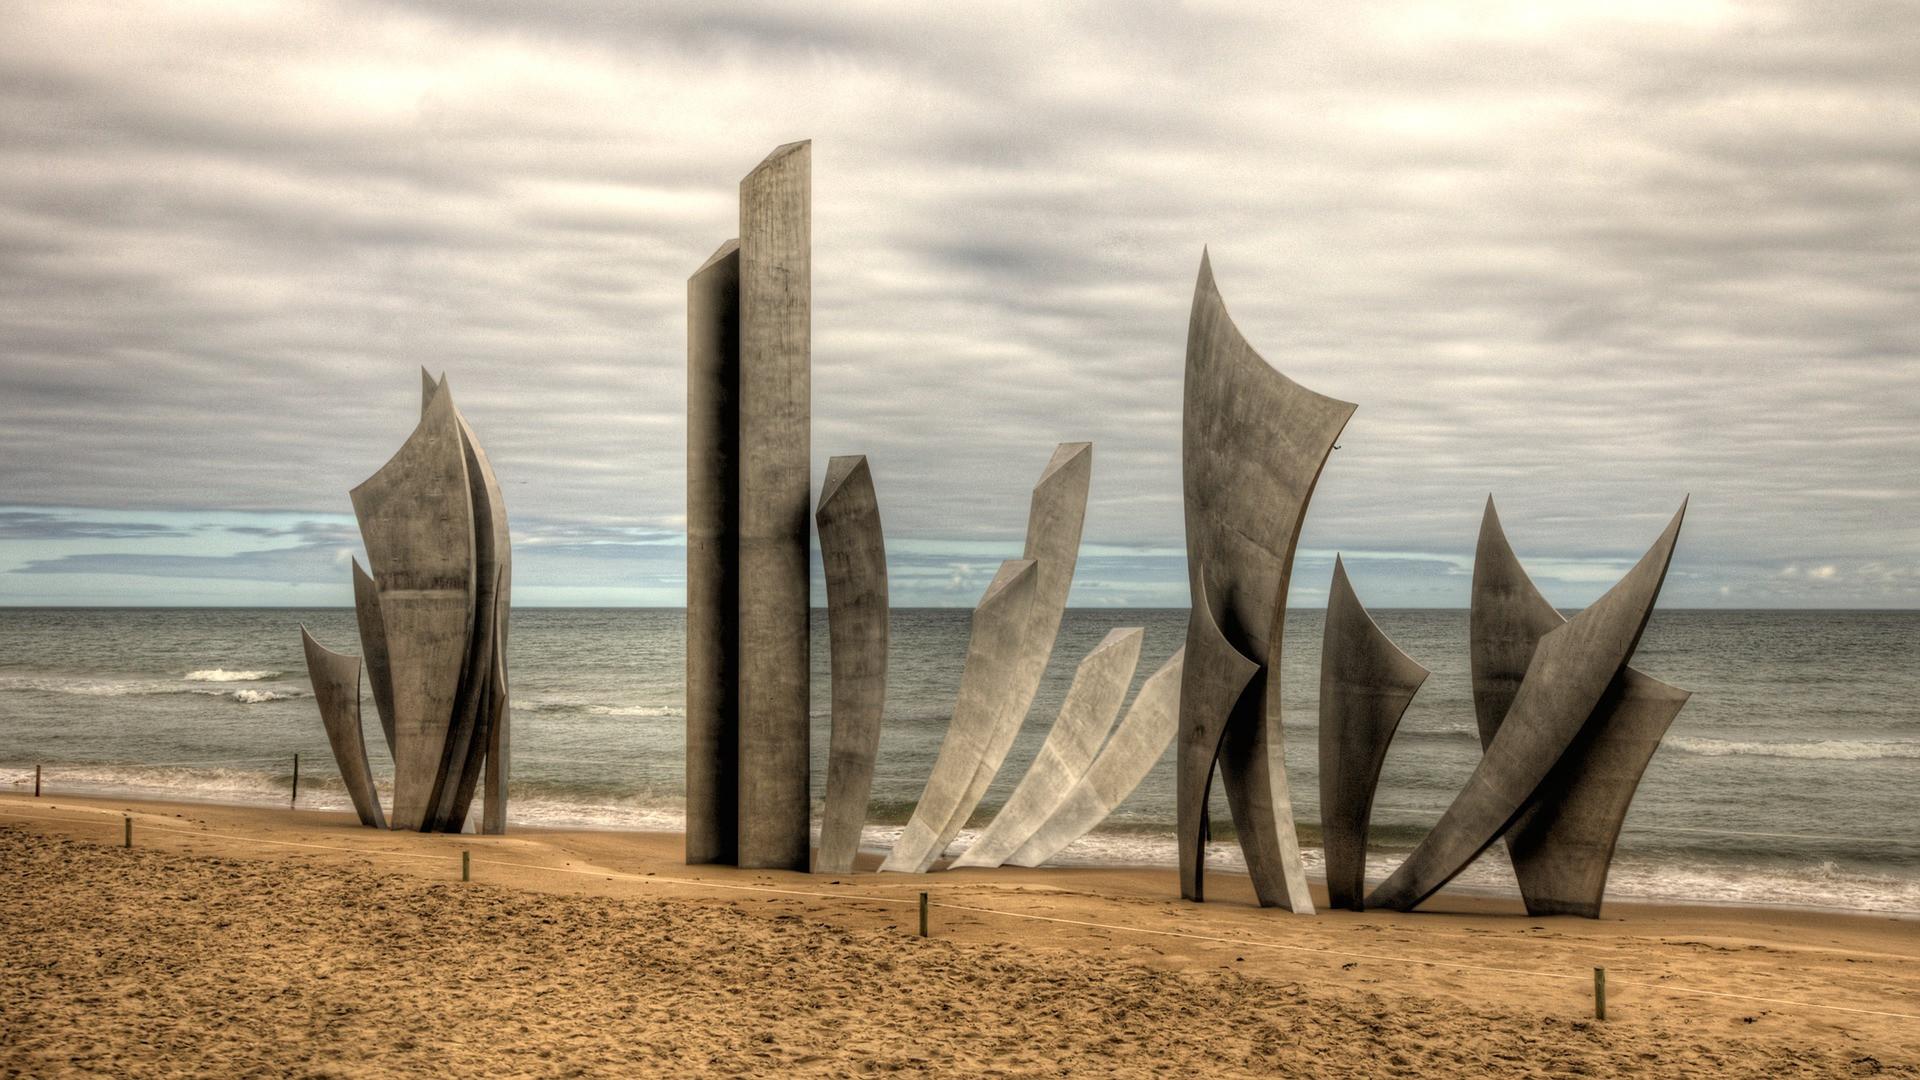 omaha-beach-2213635_1920 - Champlain Tou